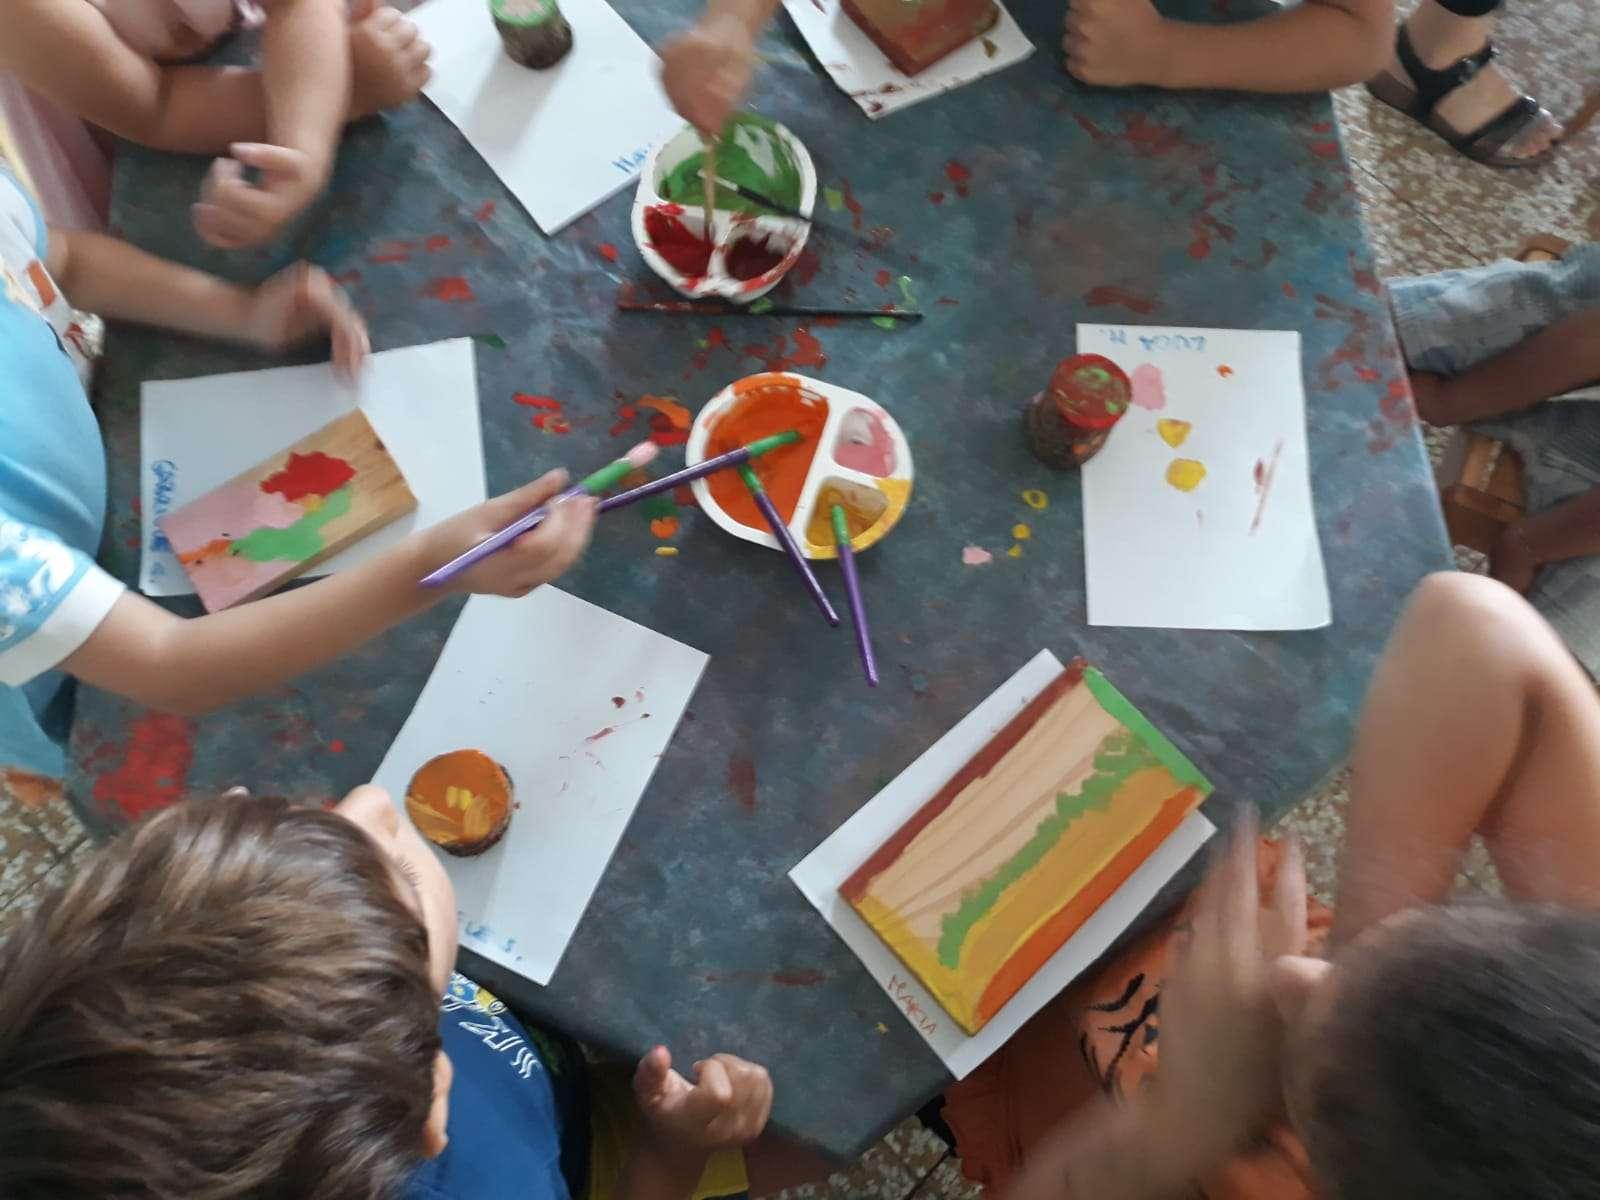 IMG 20190803 WA0003 - Scuola Materna Peschiera Borromeo